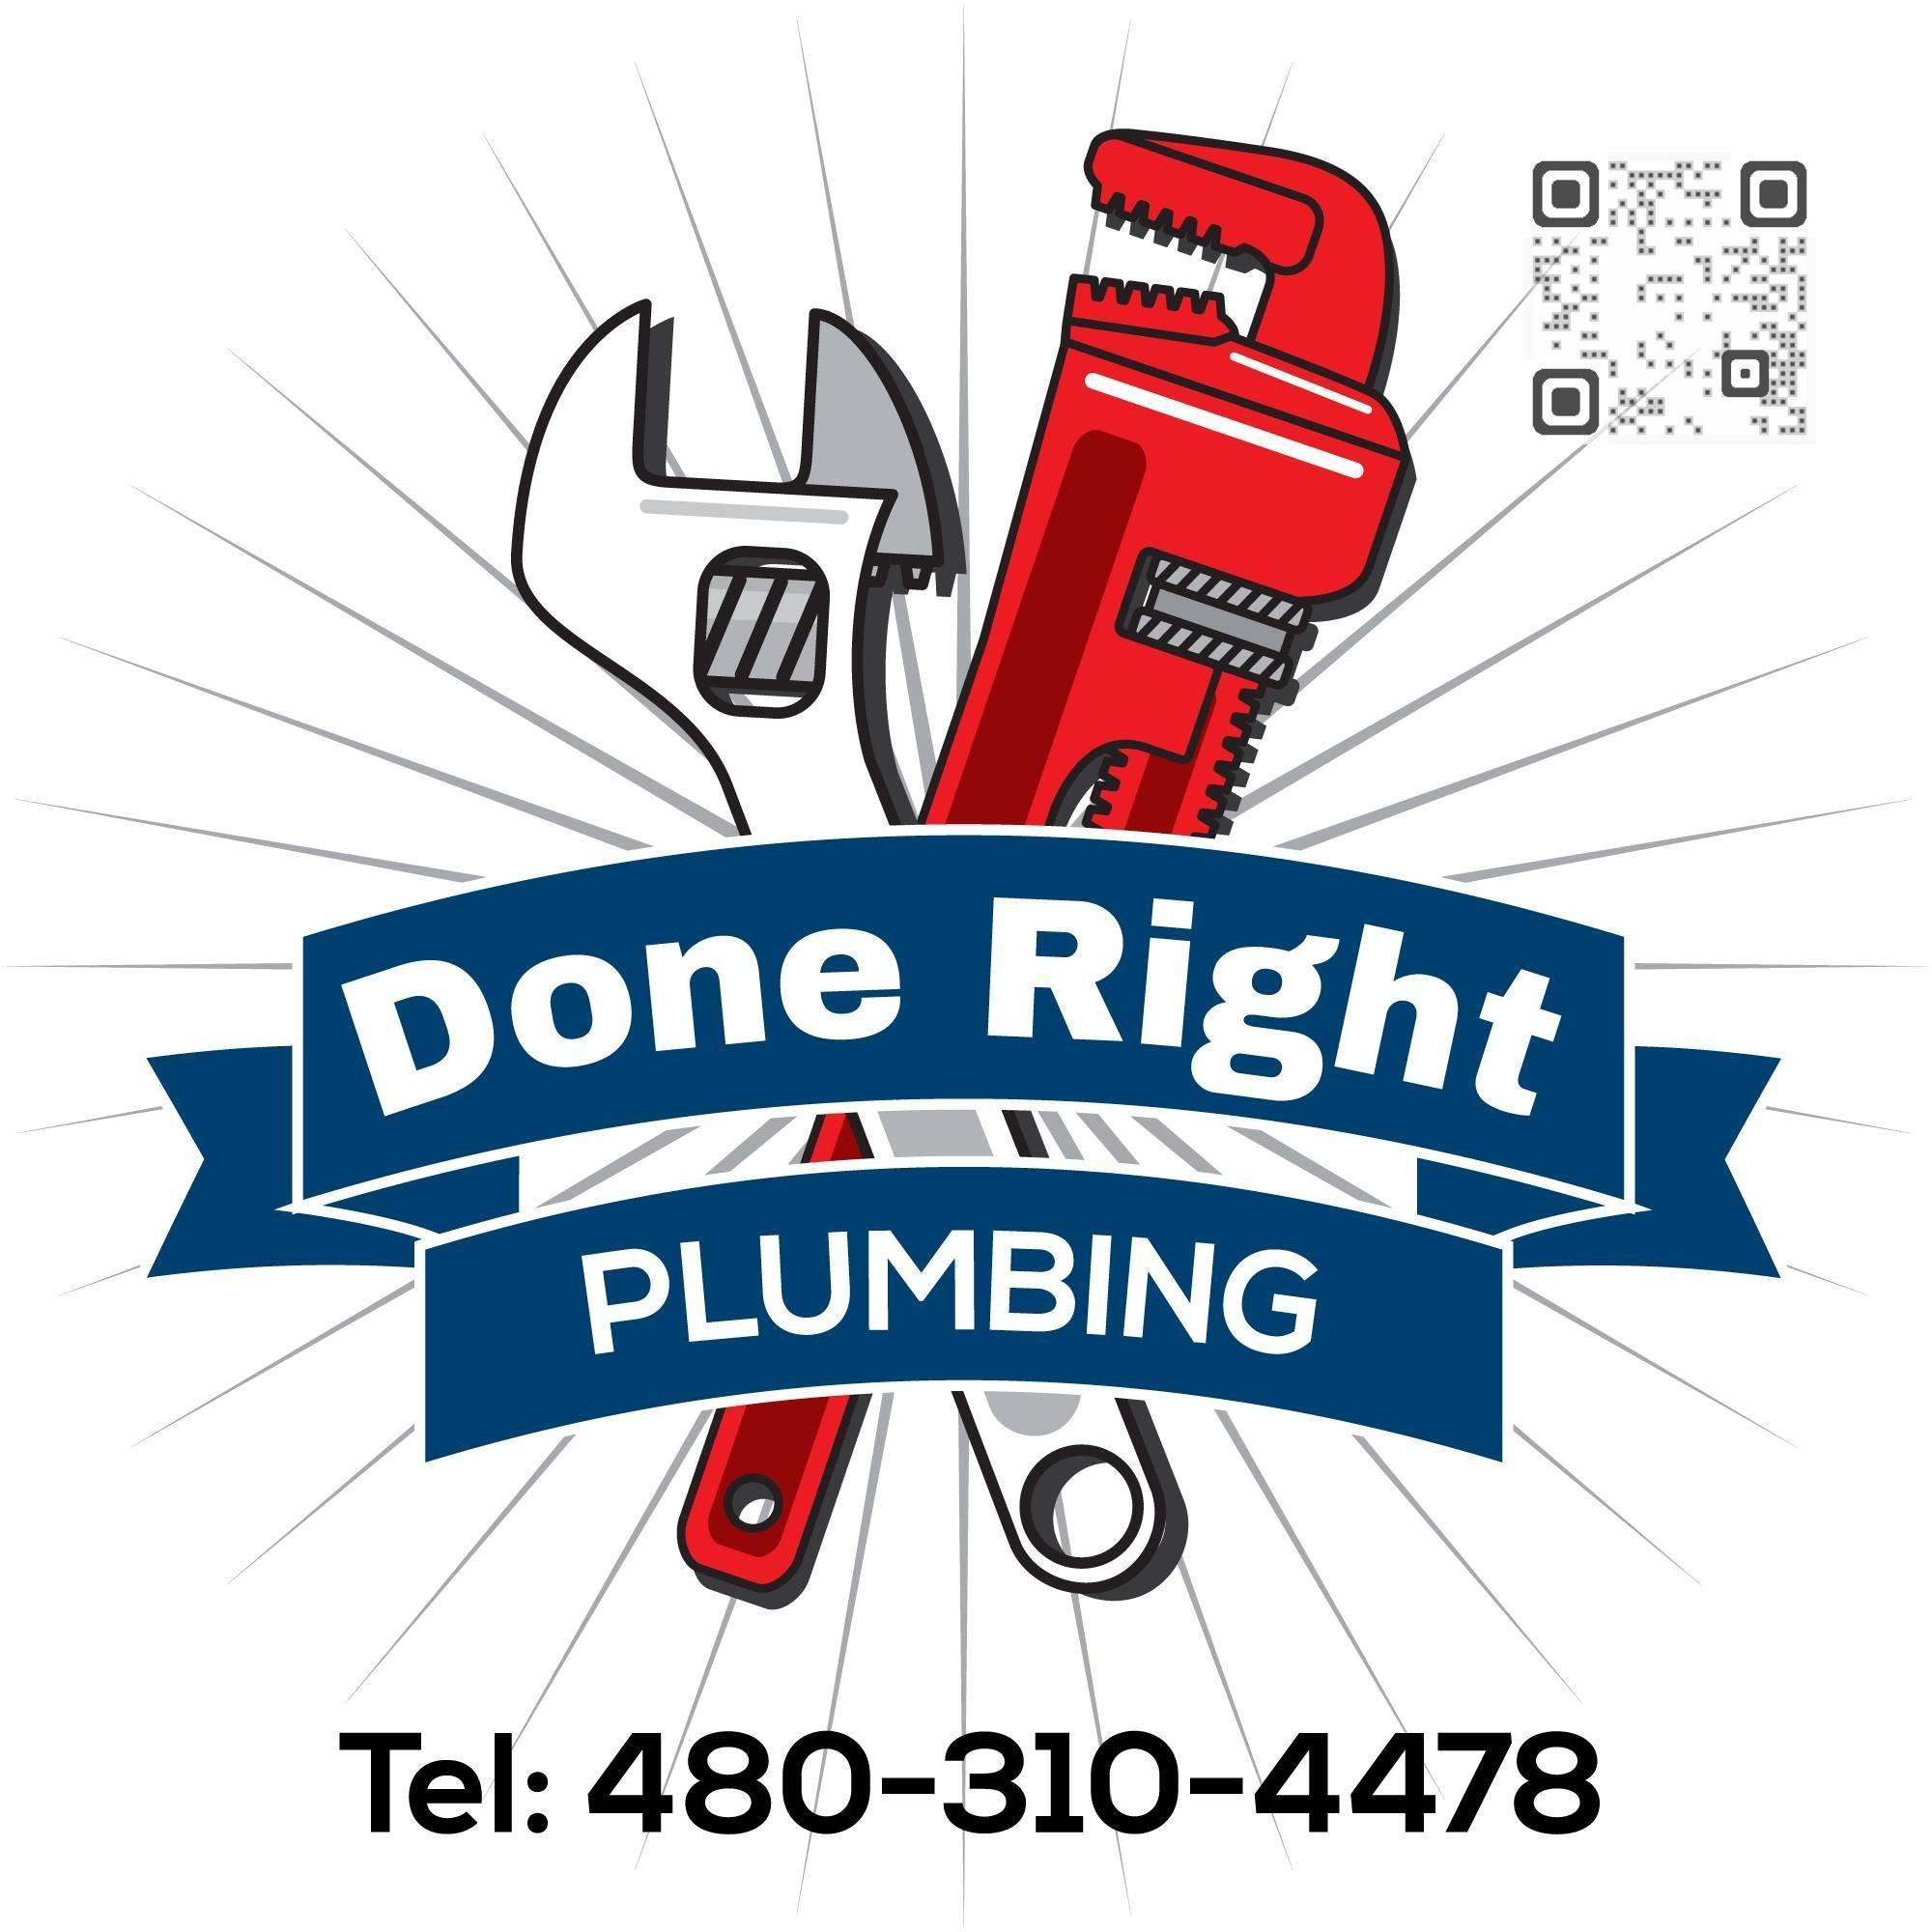 Done Right Plumbing Mesa Arizona Az Localdatabase Com